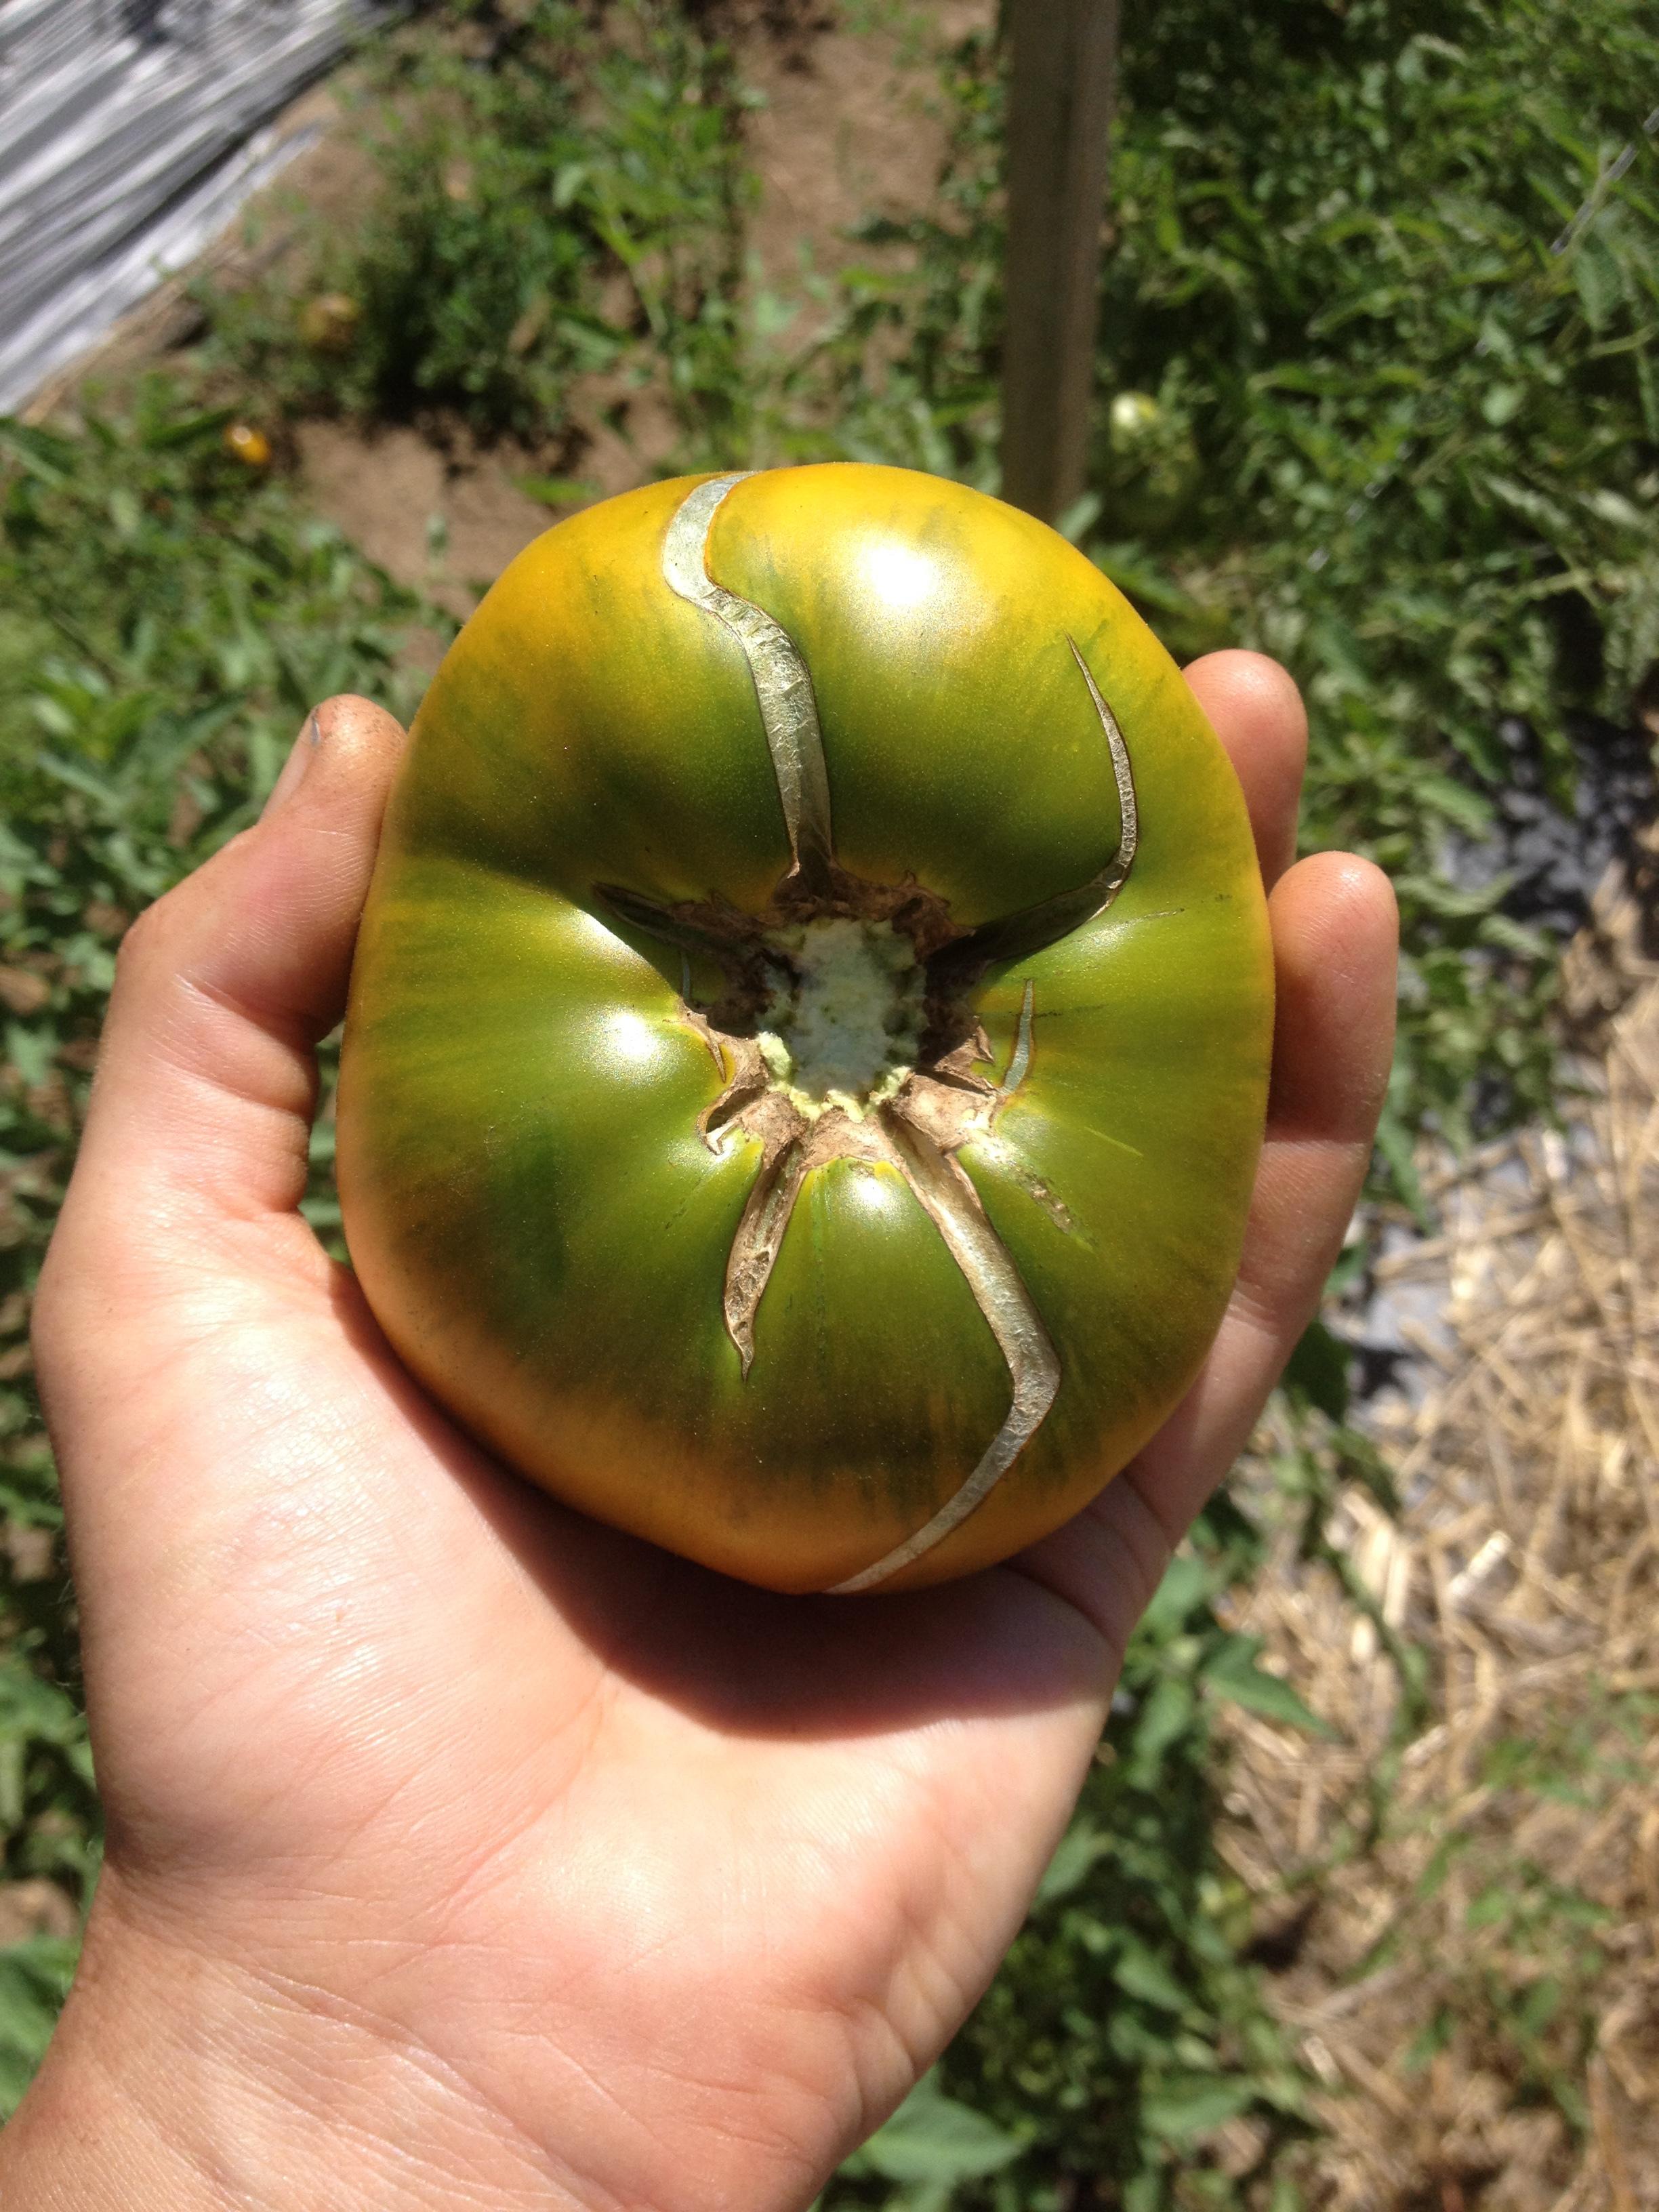 Cracking on a Cherokee Green tomato.